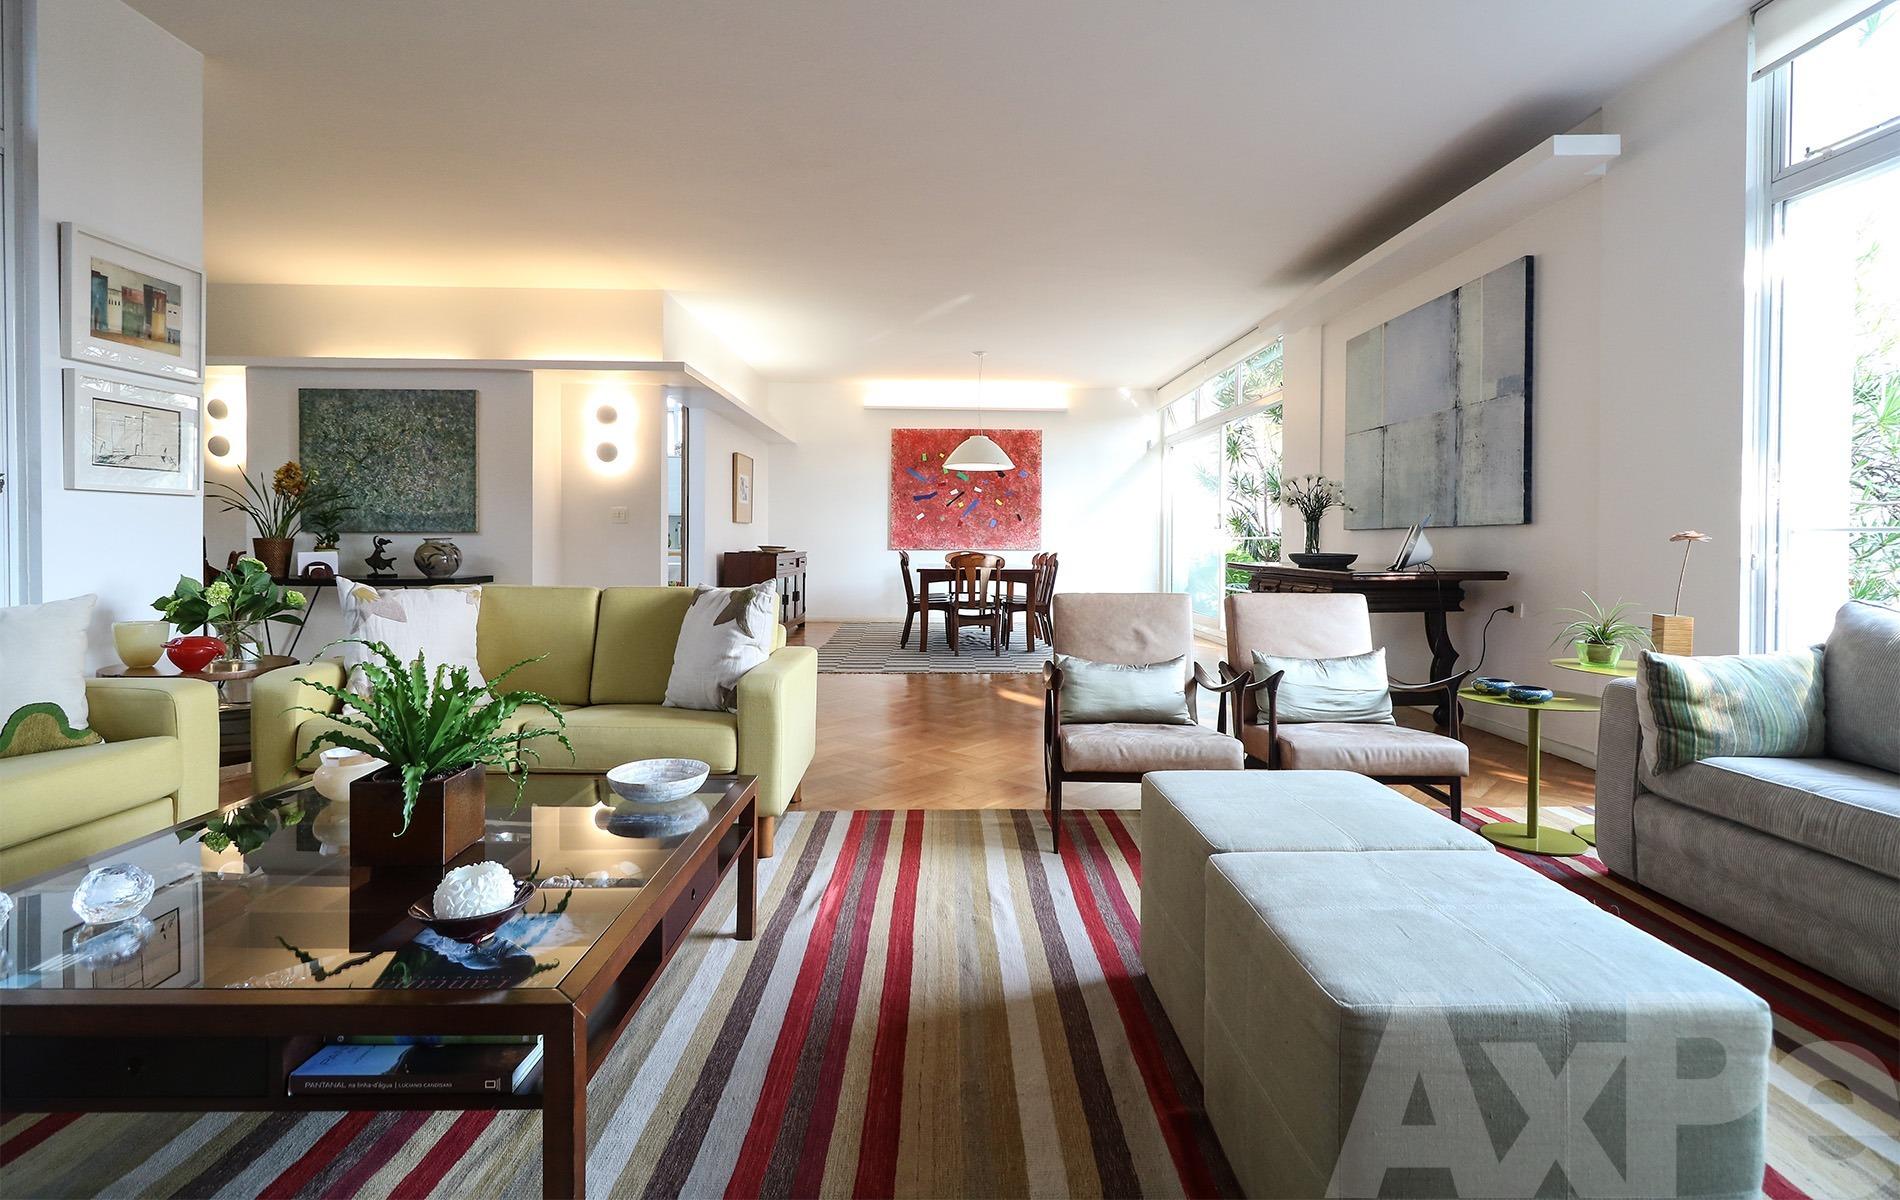 Axpe Casa - AX141092